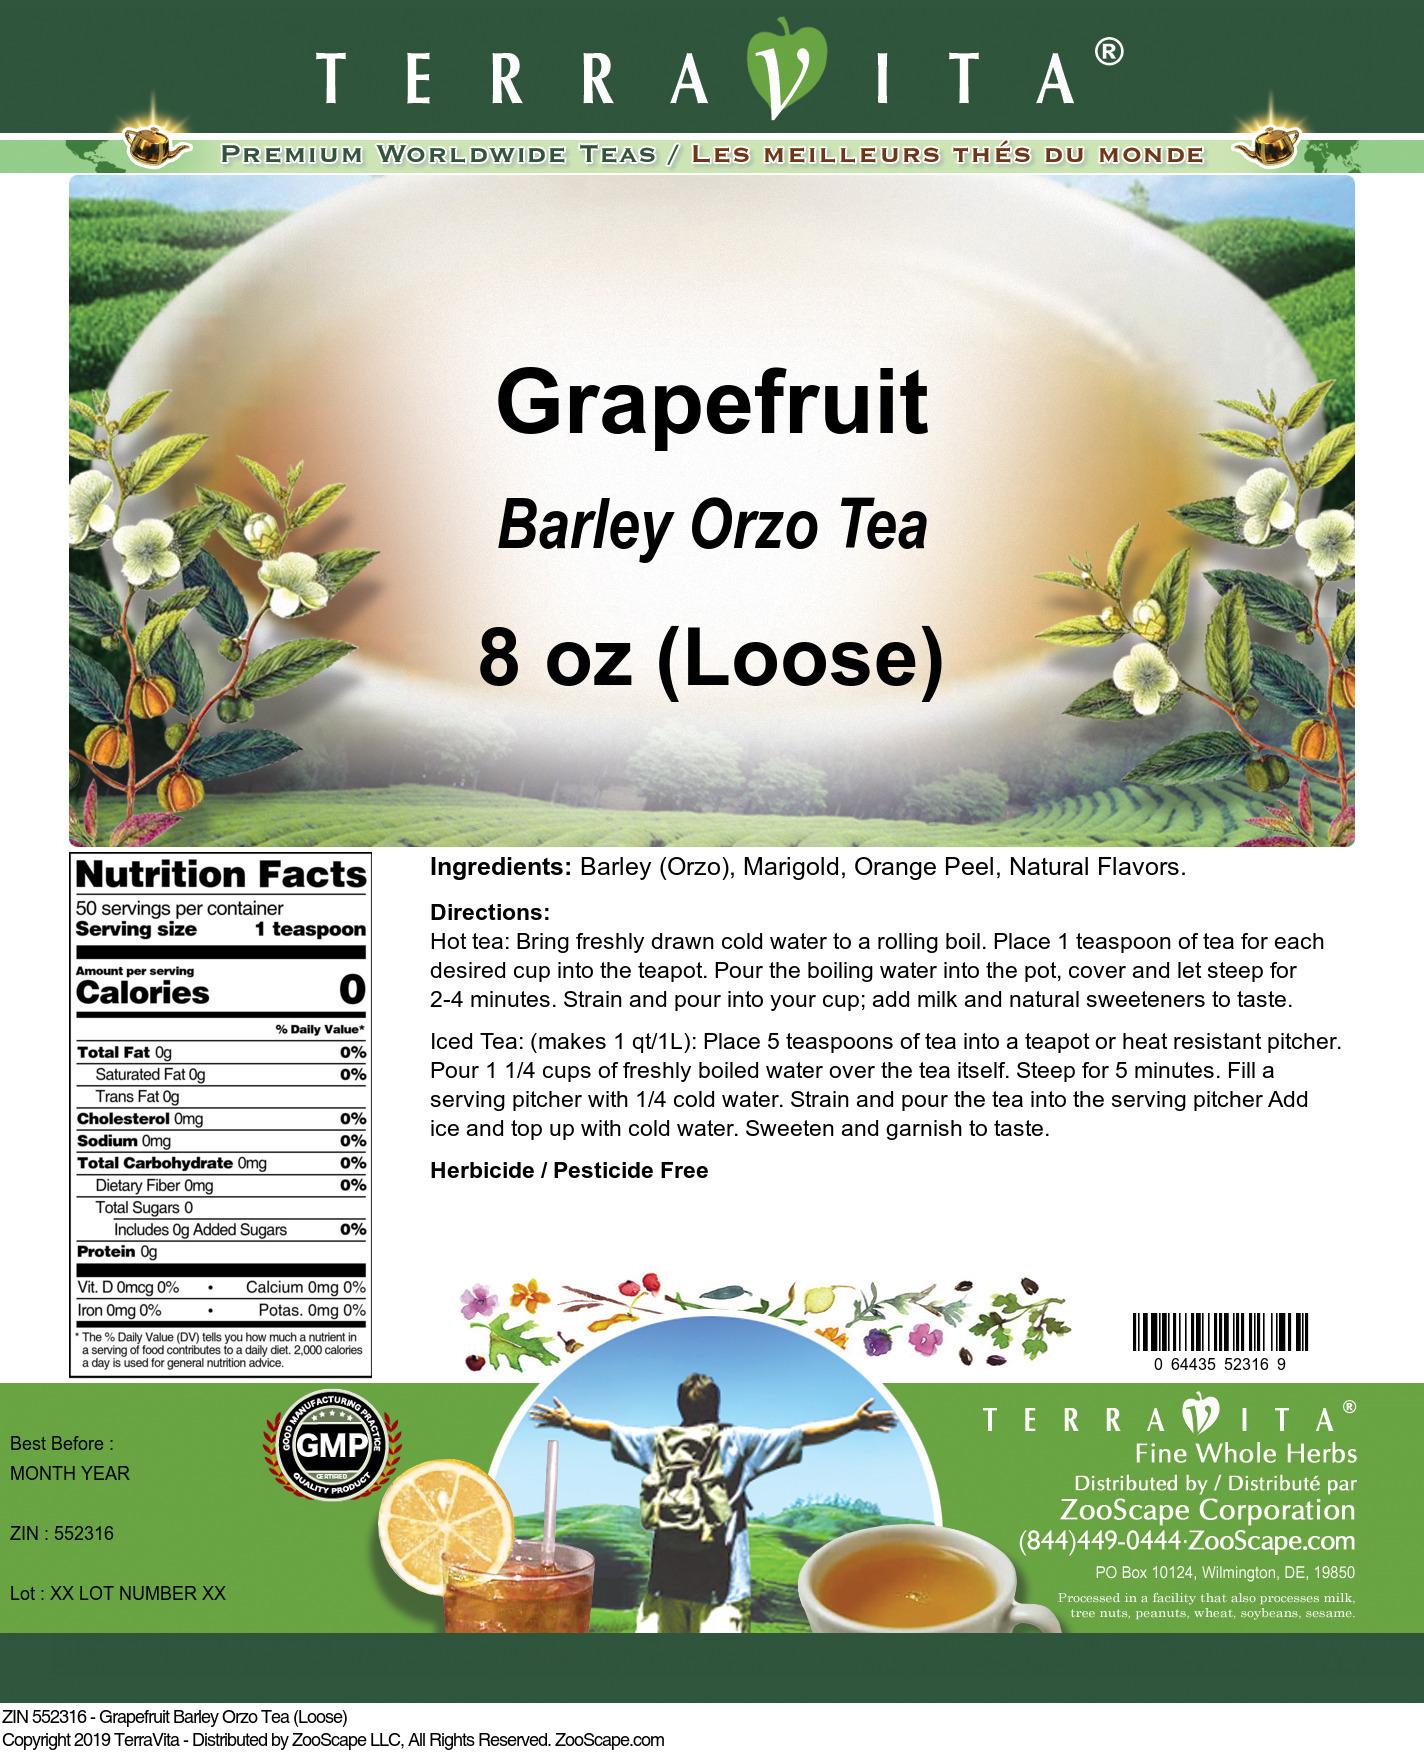 Grapefruit Barley Orzo Tea (Loose)